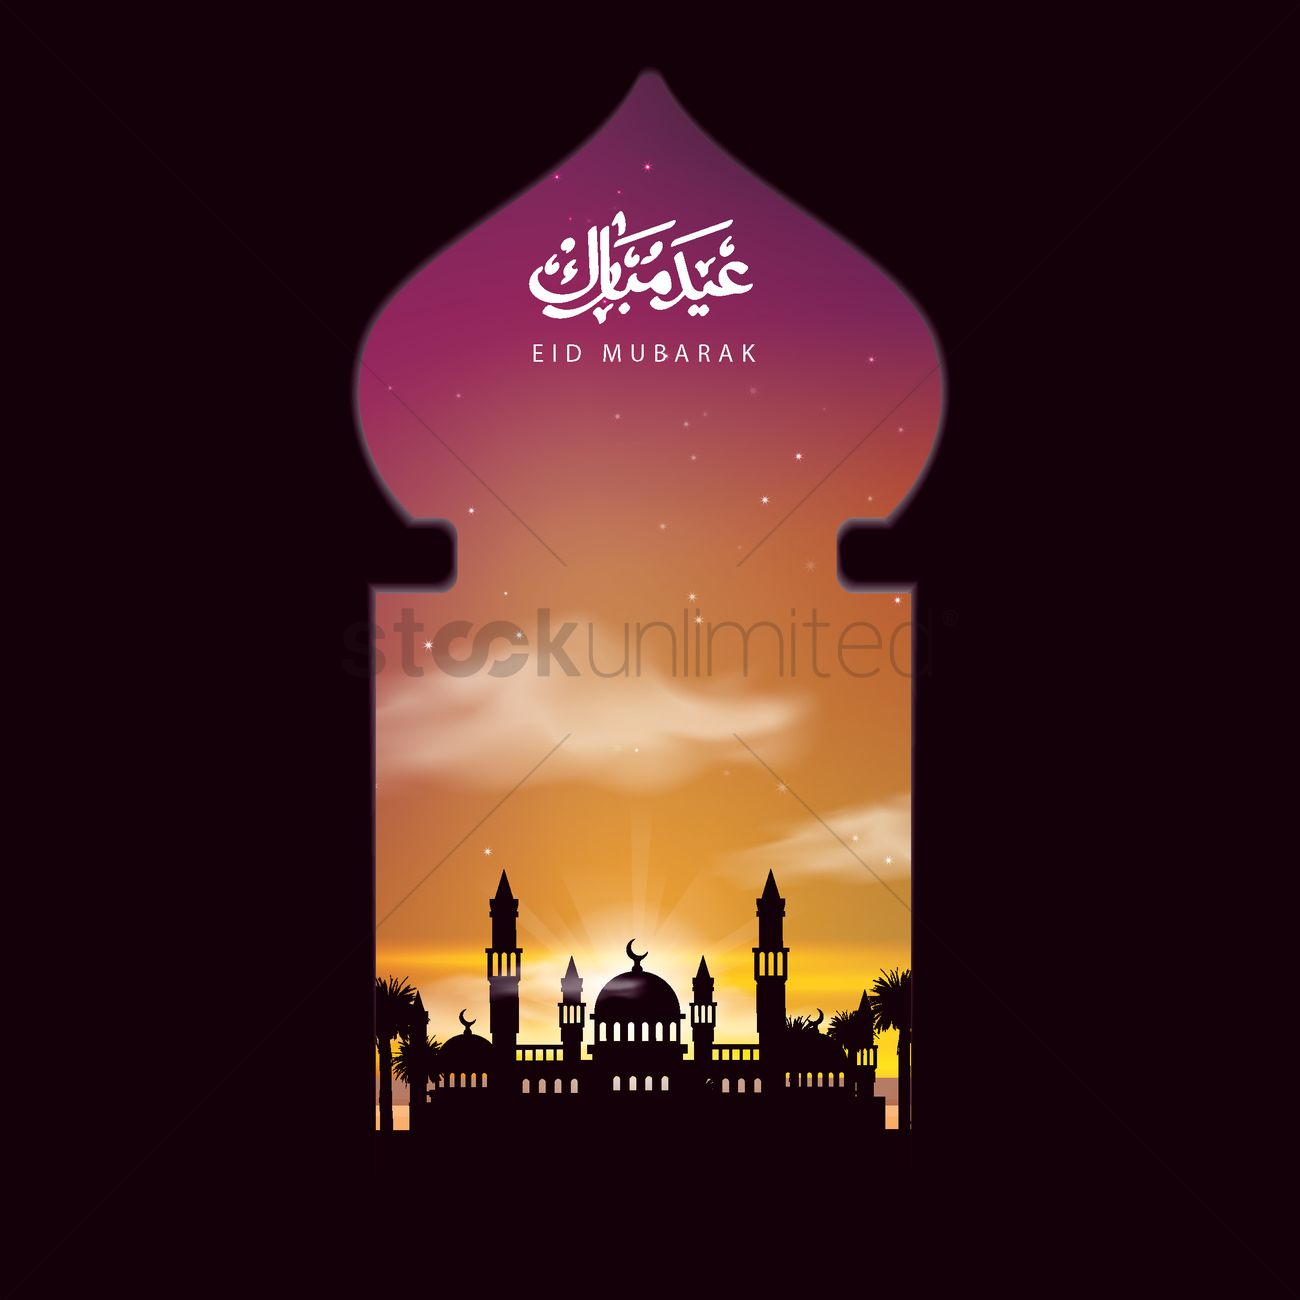 Eid mubarak greeting vector image 1828277 stockunlimited eid mubarak greeting vector graphic kristyandbryce Choice Image